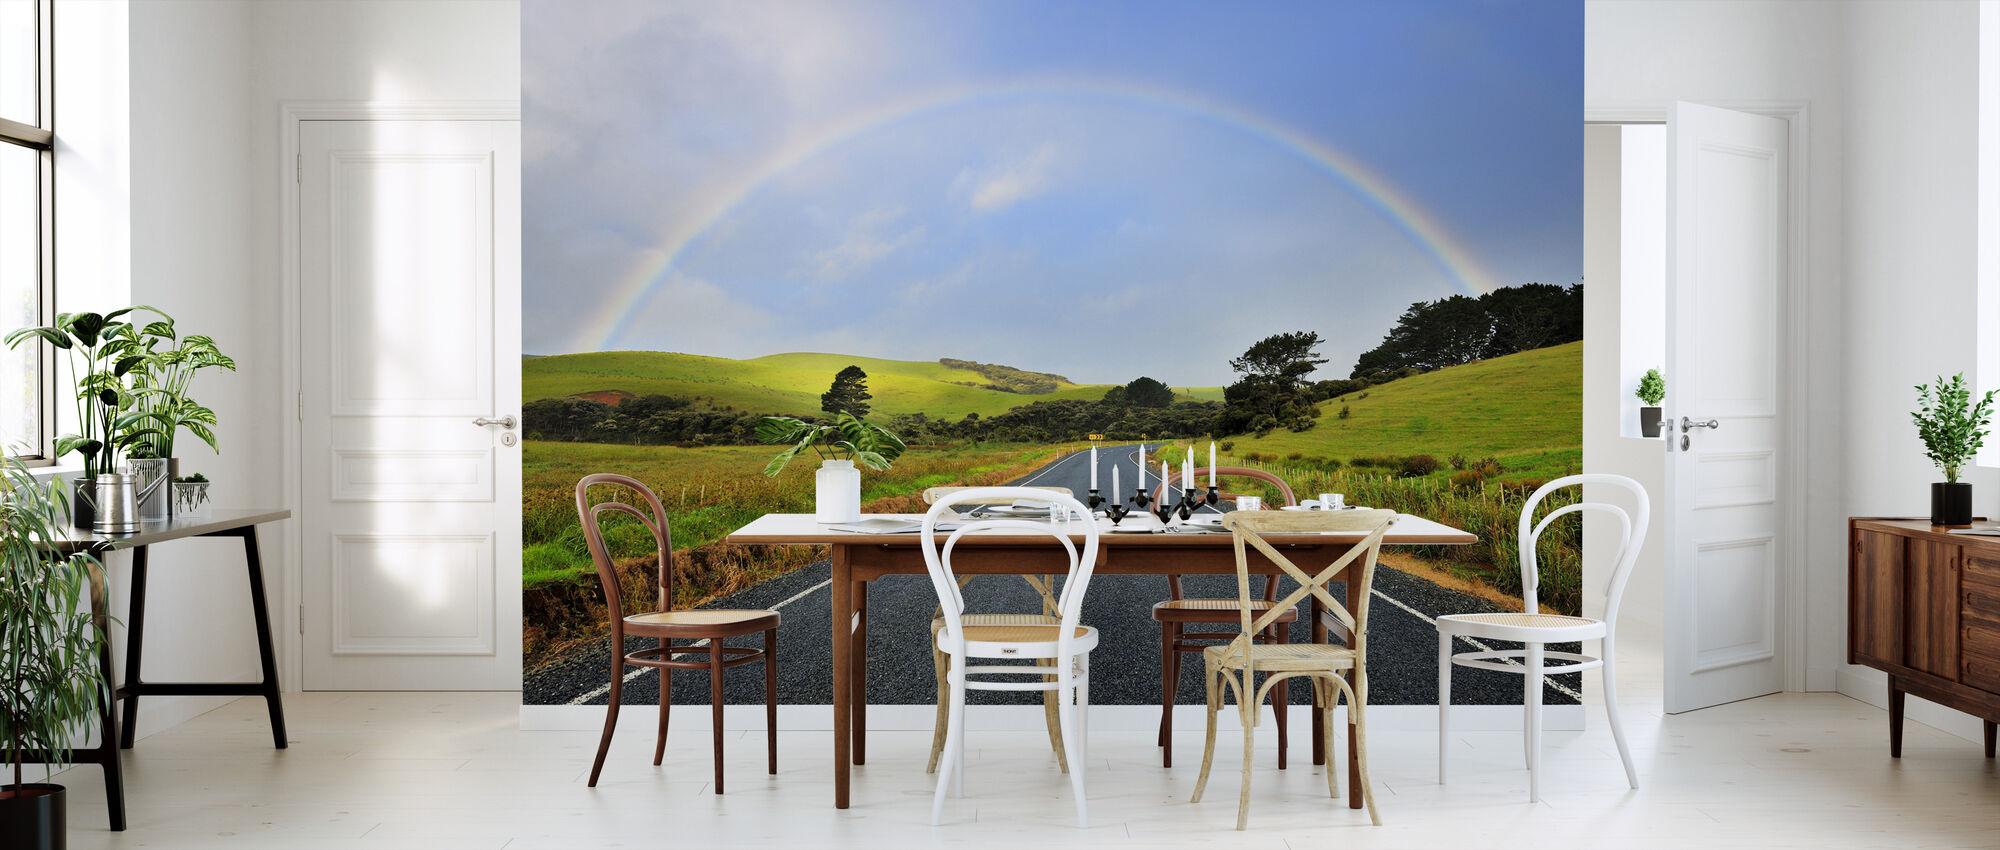 Rainbow Road - Wallpaper - Kitchen